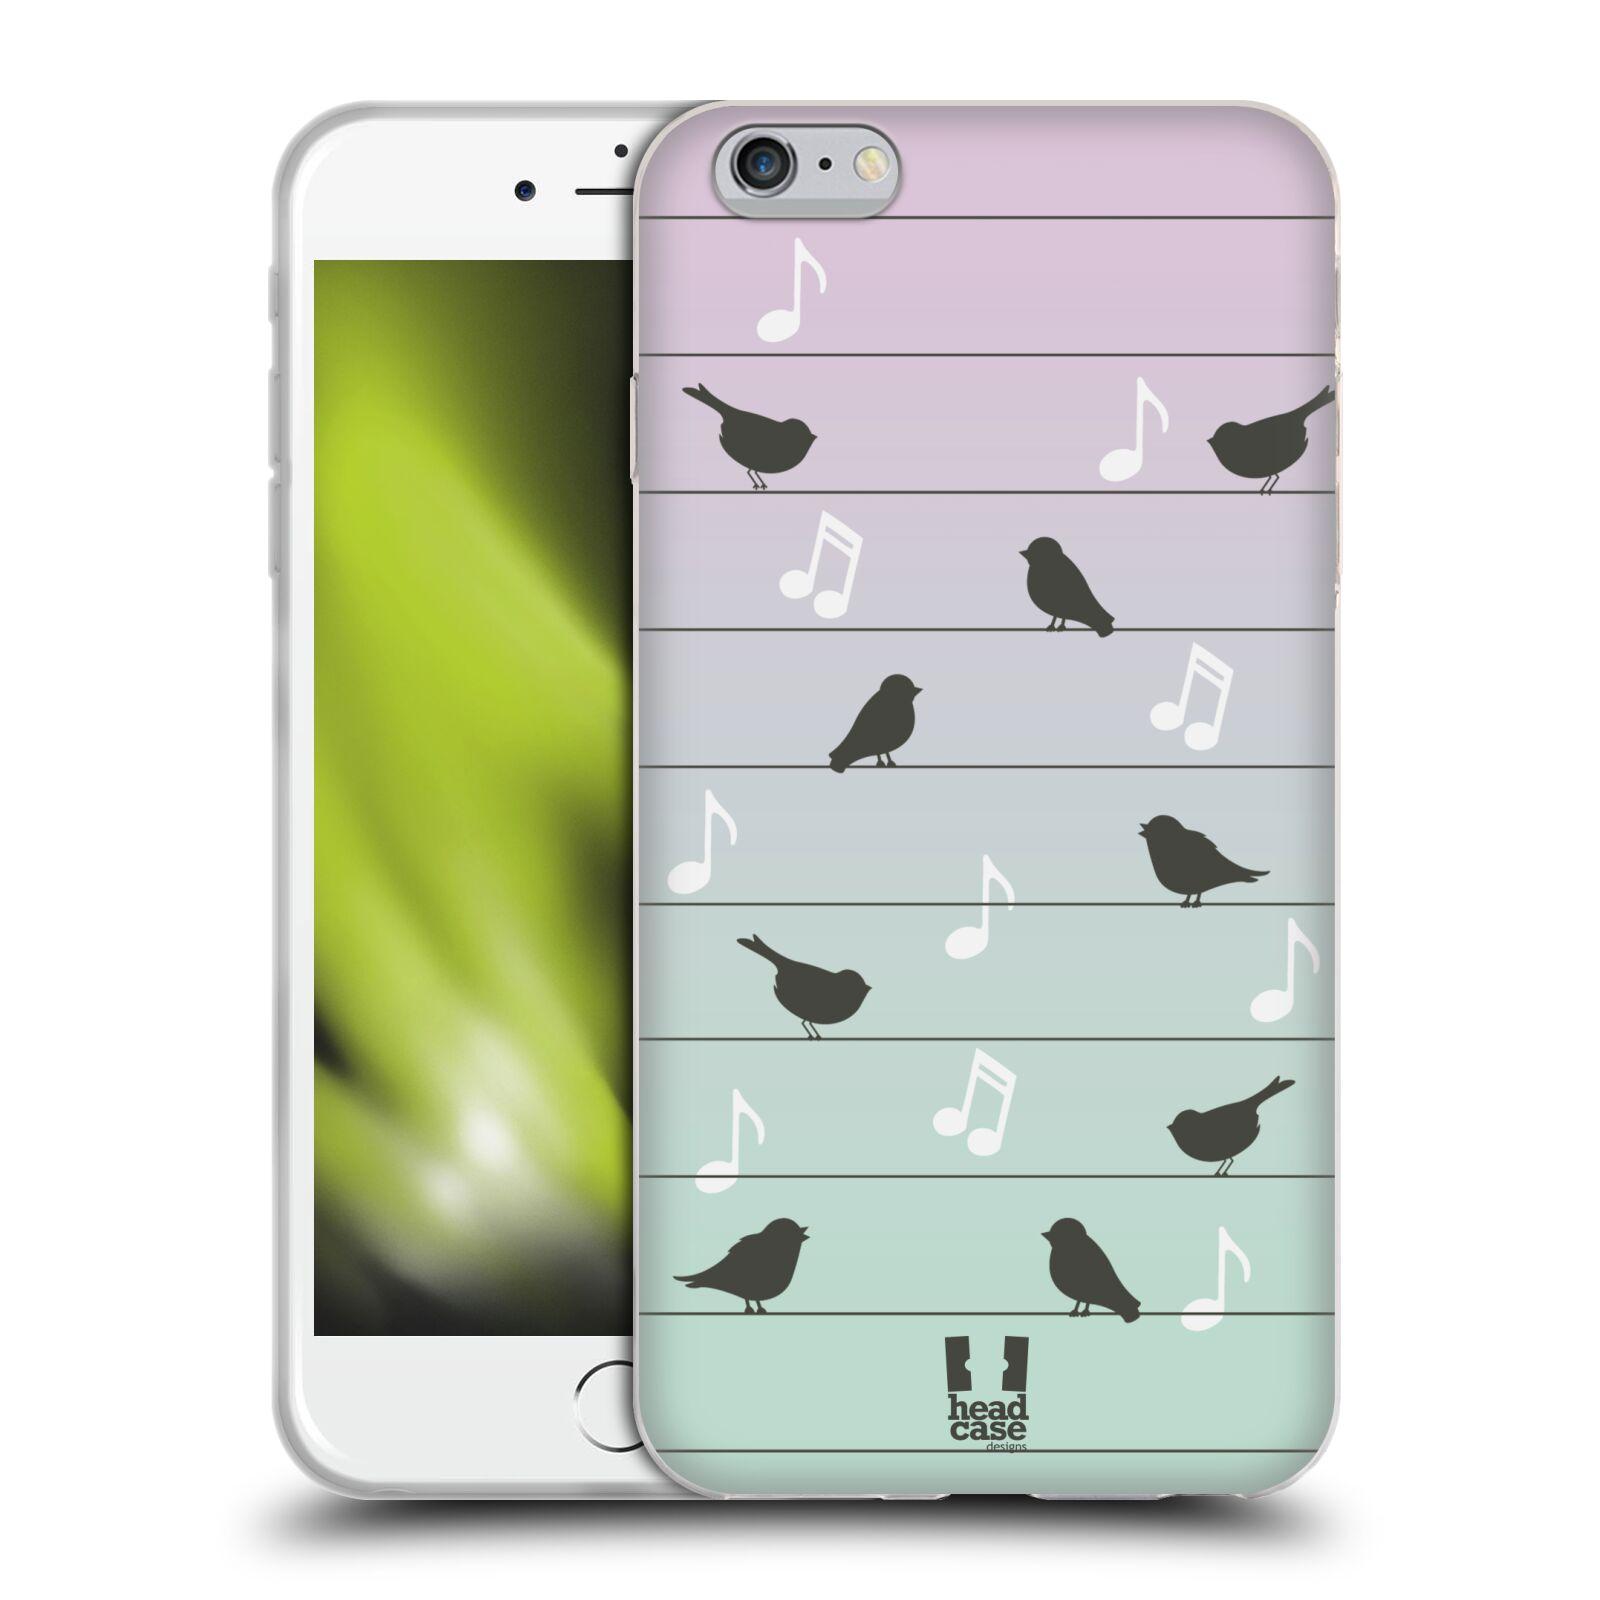 HEAD CASE silikonový obal na mobil Apple Iphone 6 PLUS/ 6S PLUS vzor Ptáček zpěváček noty na drátě